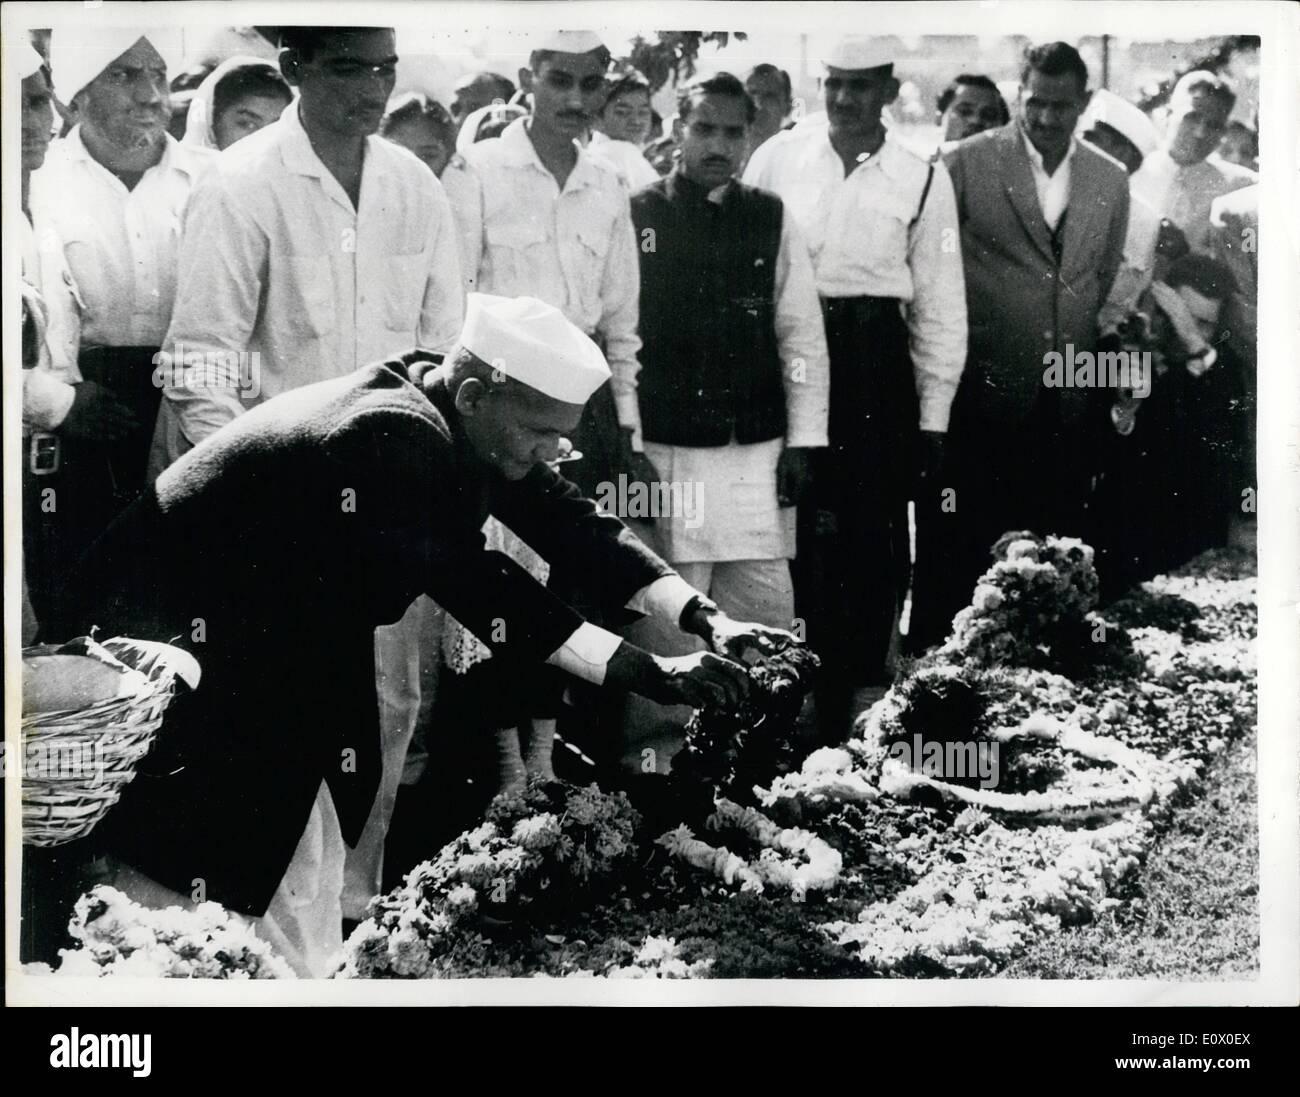 Nov. 11, 1964 - India Commemorates 75th. Anniversary Of The Birth Of Mr. Nehru: Mr. Lal Bahadur Shastri - India's Stock Photo